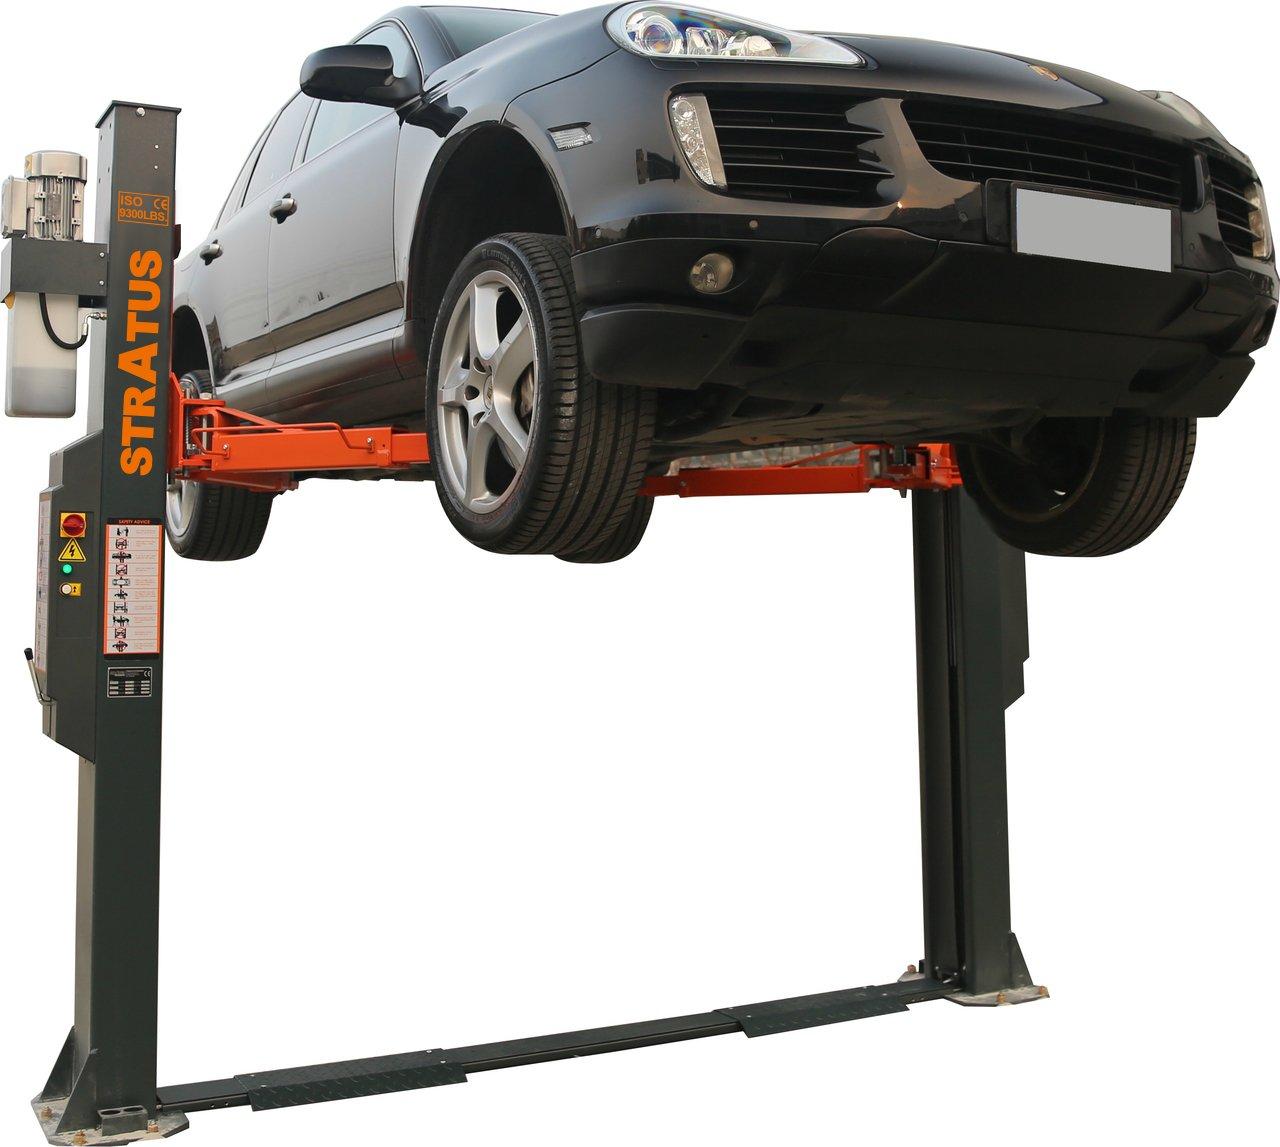 Stratus Commercial Grade BasePlate 9,300 lbs Capacity Car Lift Auto Hoist